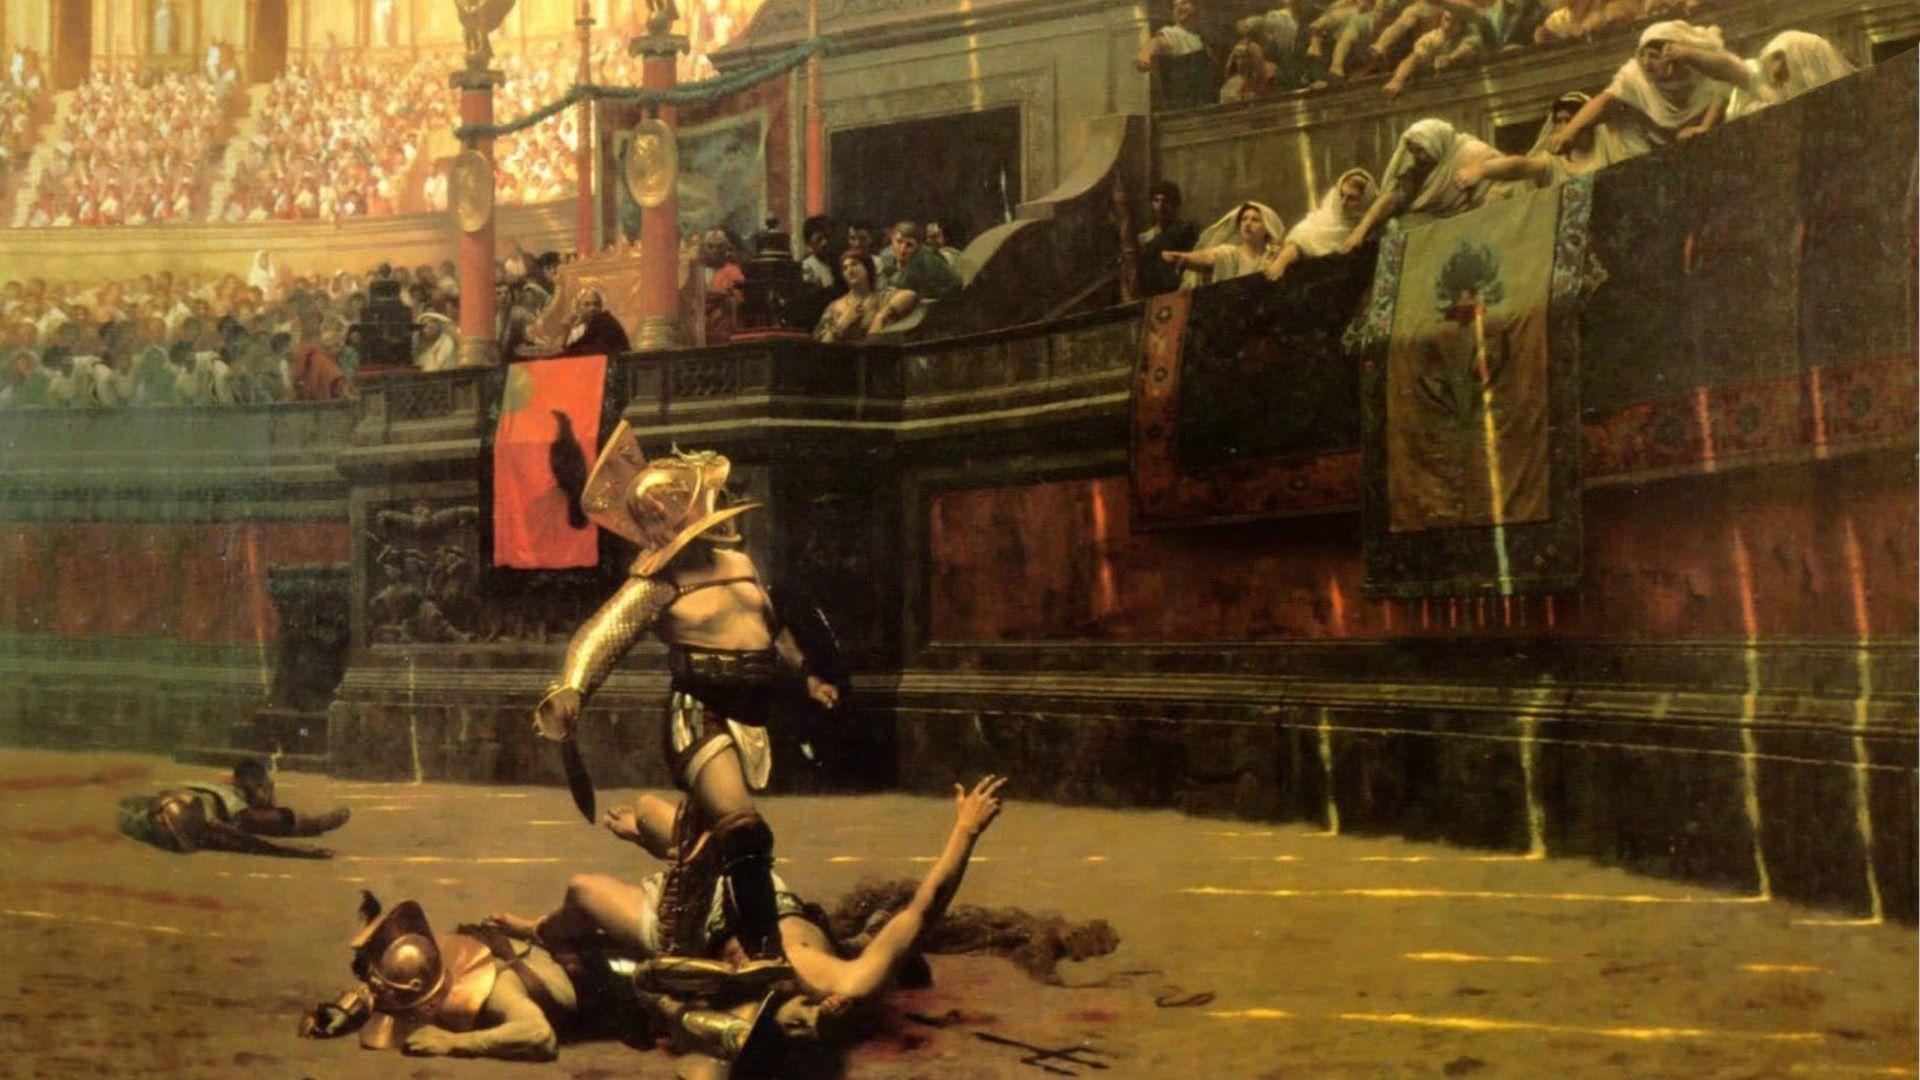 Artistic painting rome arena gladiator artistic wallpaper combat artistic painting rome arena gladiator artistic wallpaper voltagebd Gallery